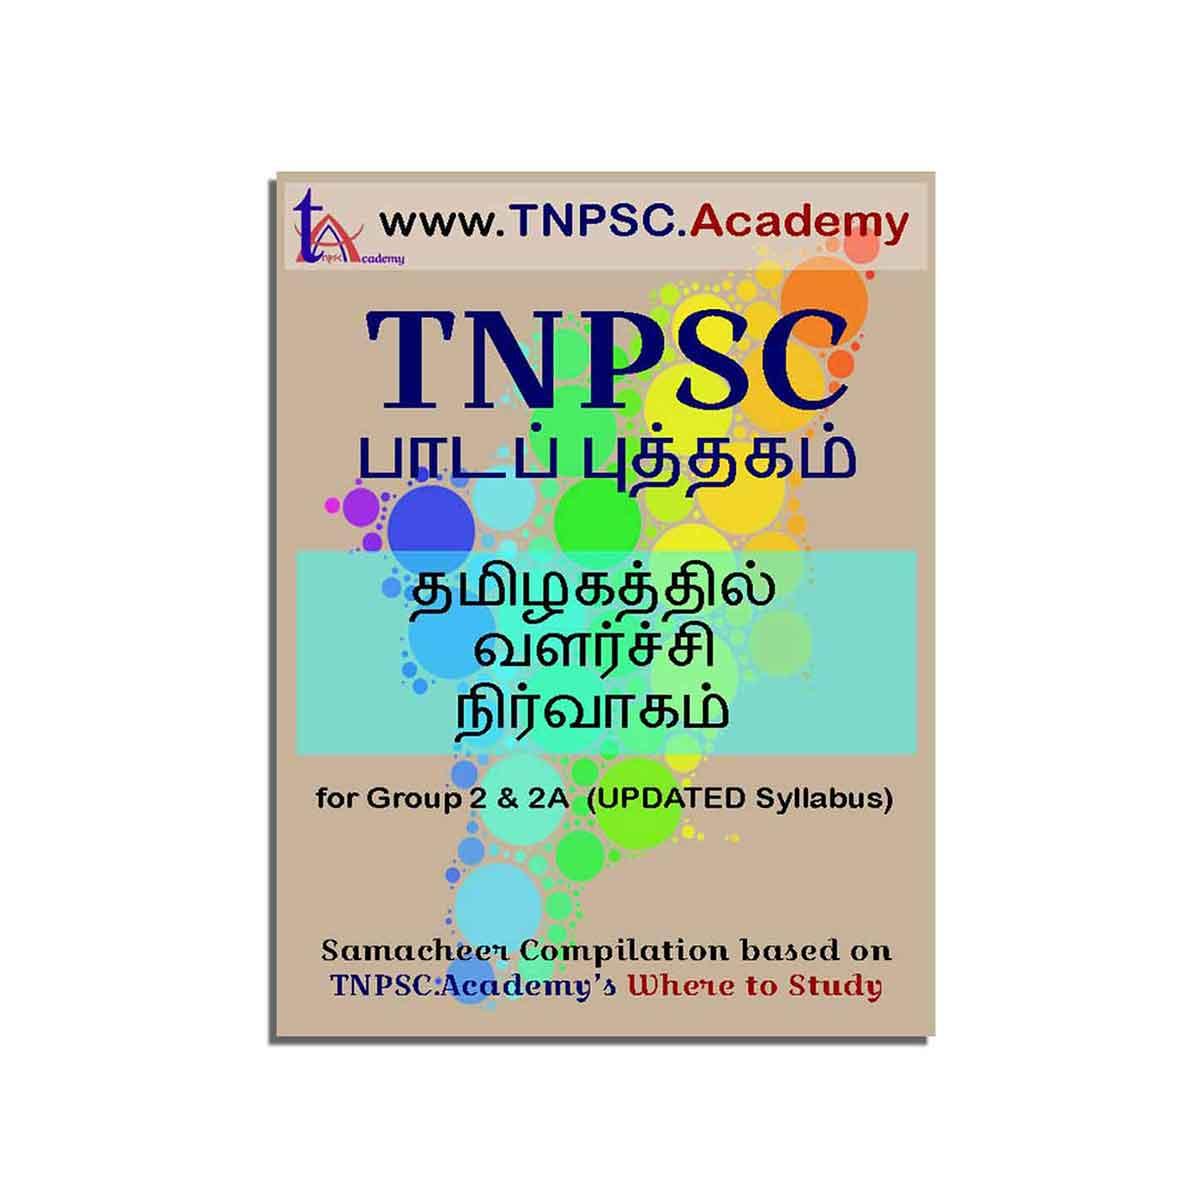 TNPSC Development Administration in Tamil